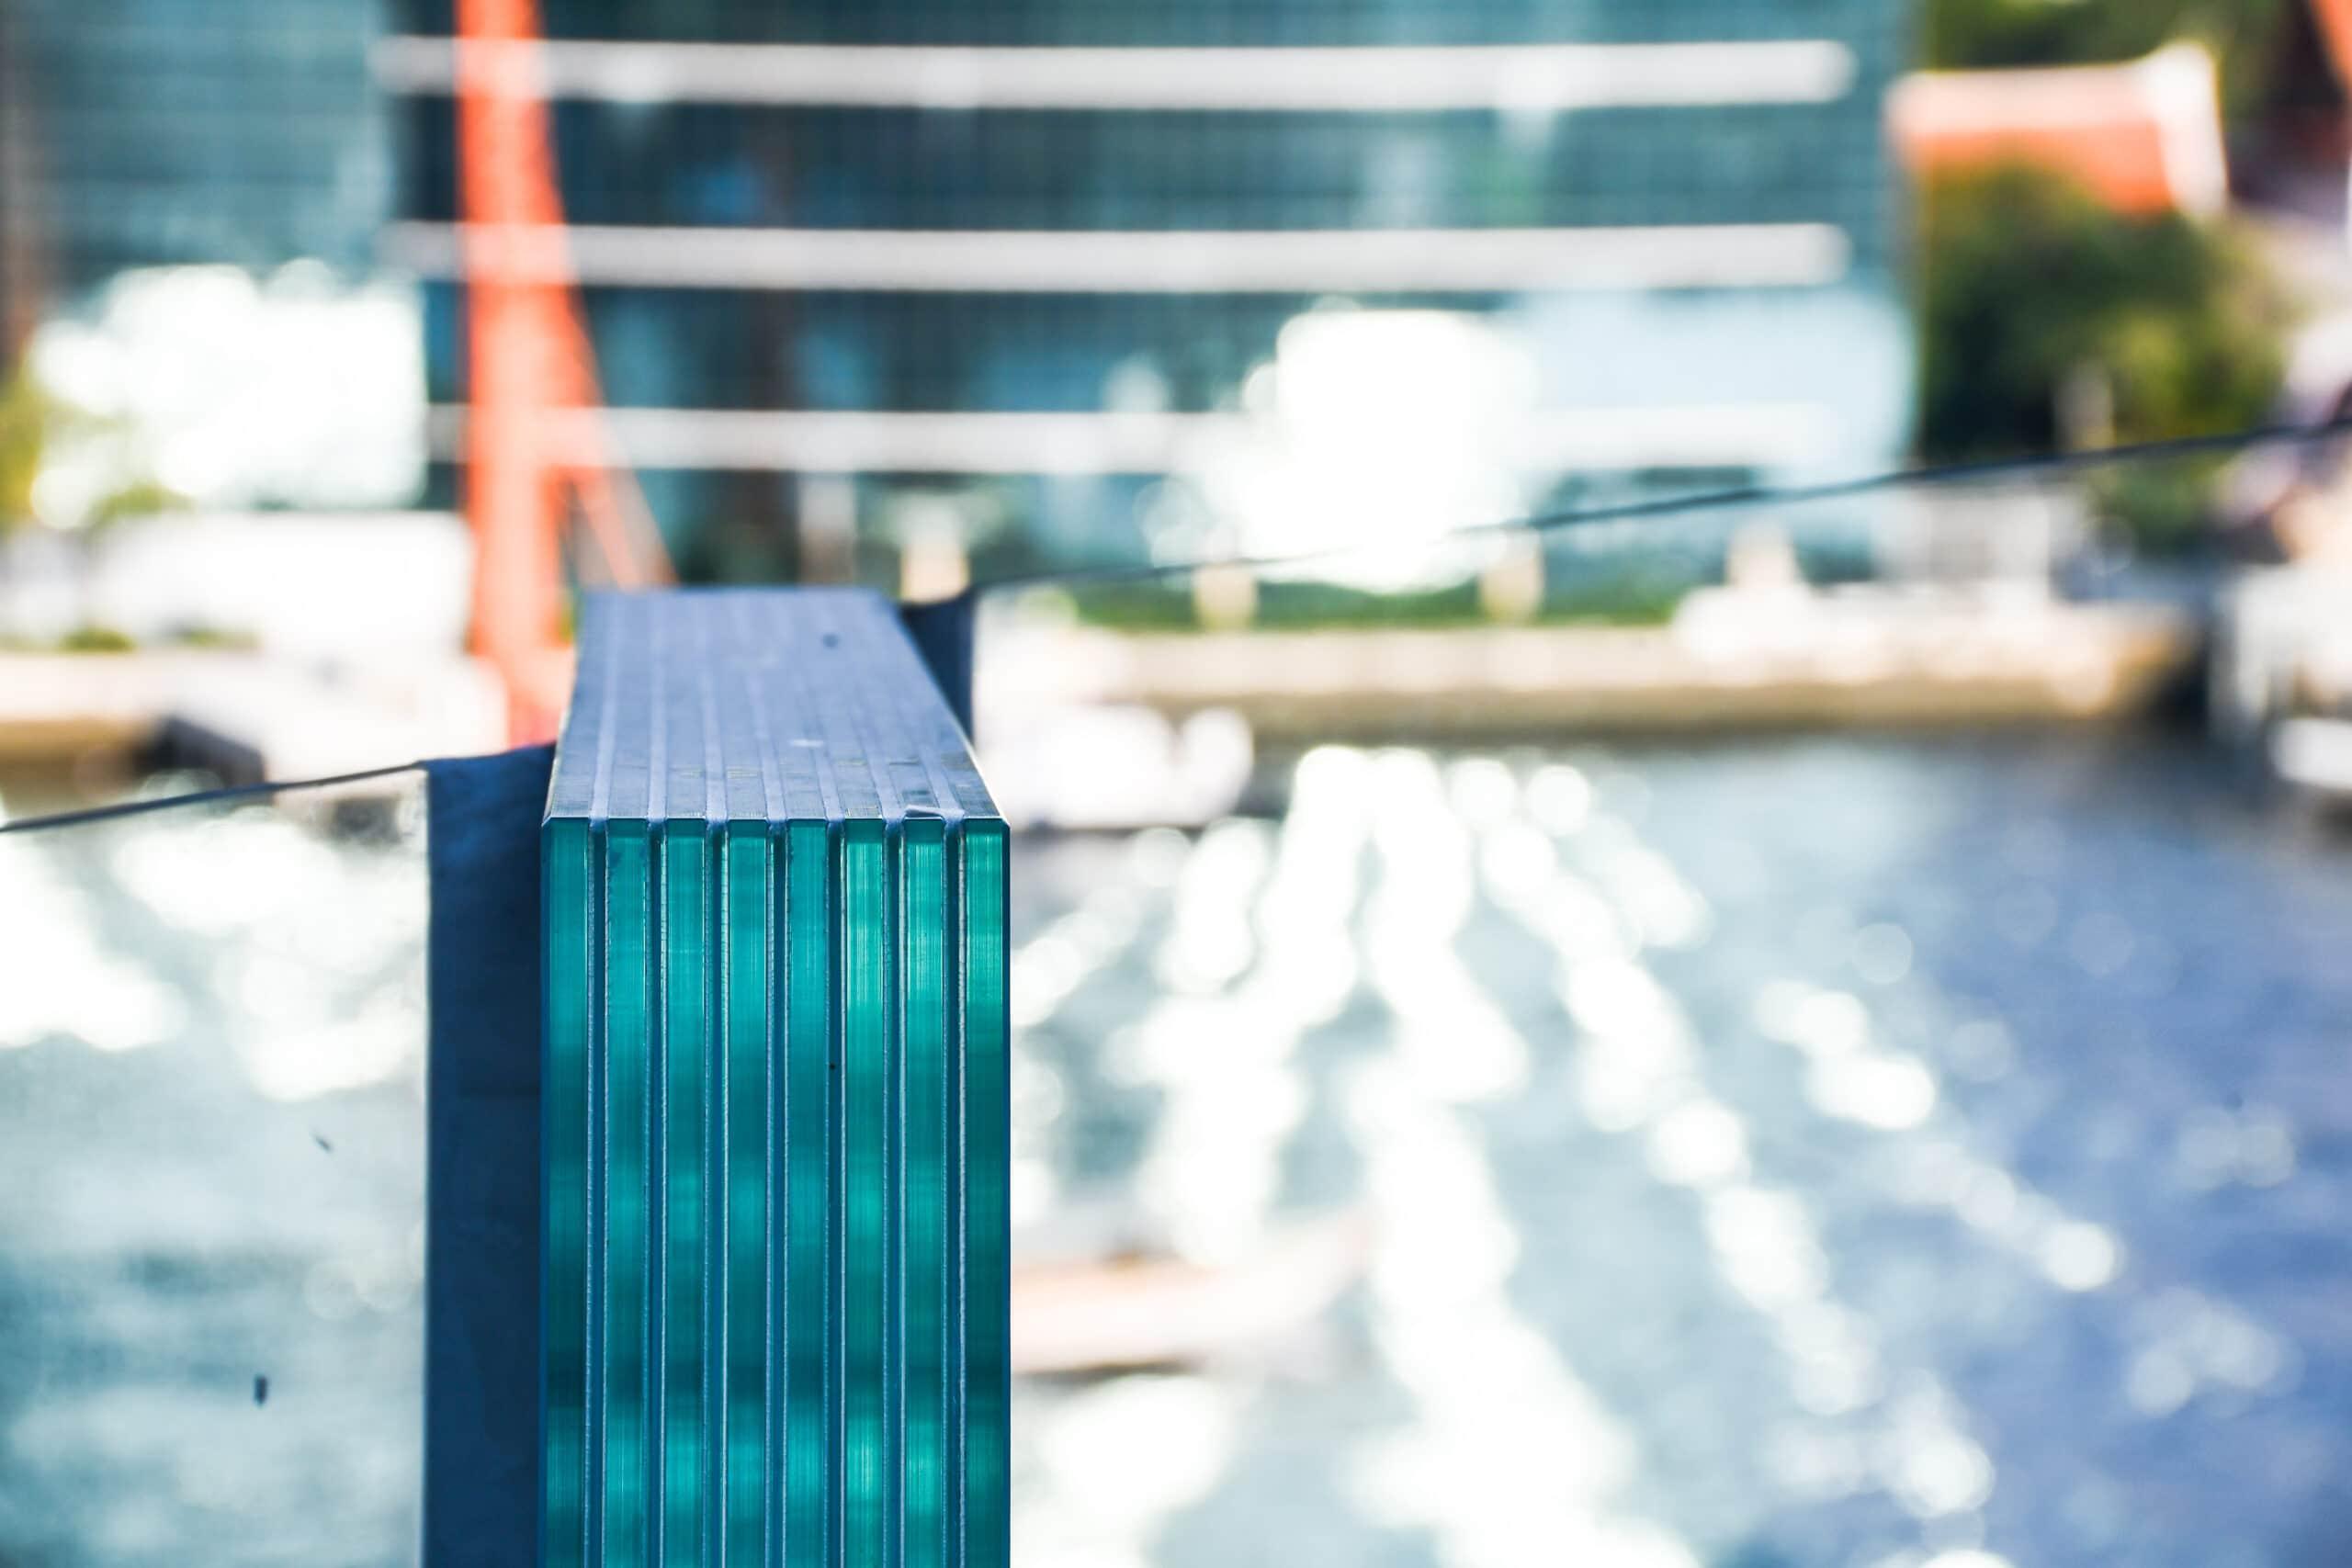 tempered laminated glass interlayer filmed panels frameless, safety glass for modern architectural buildings.